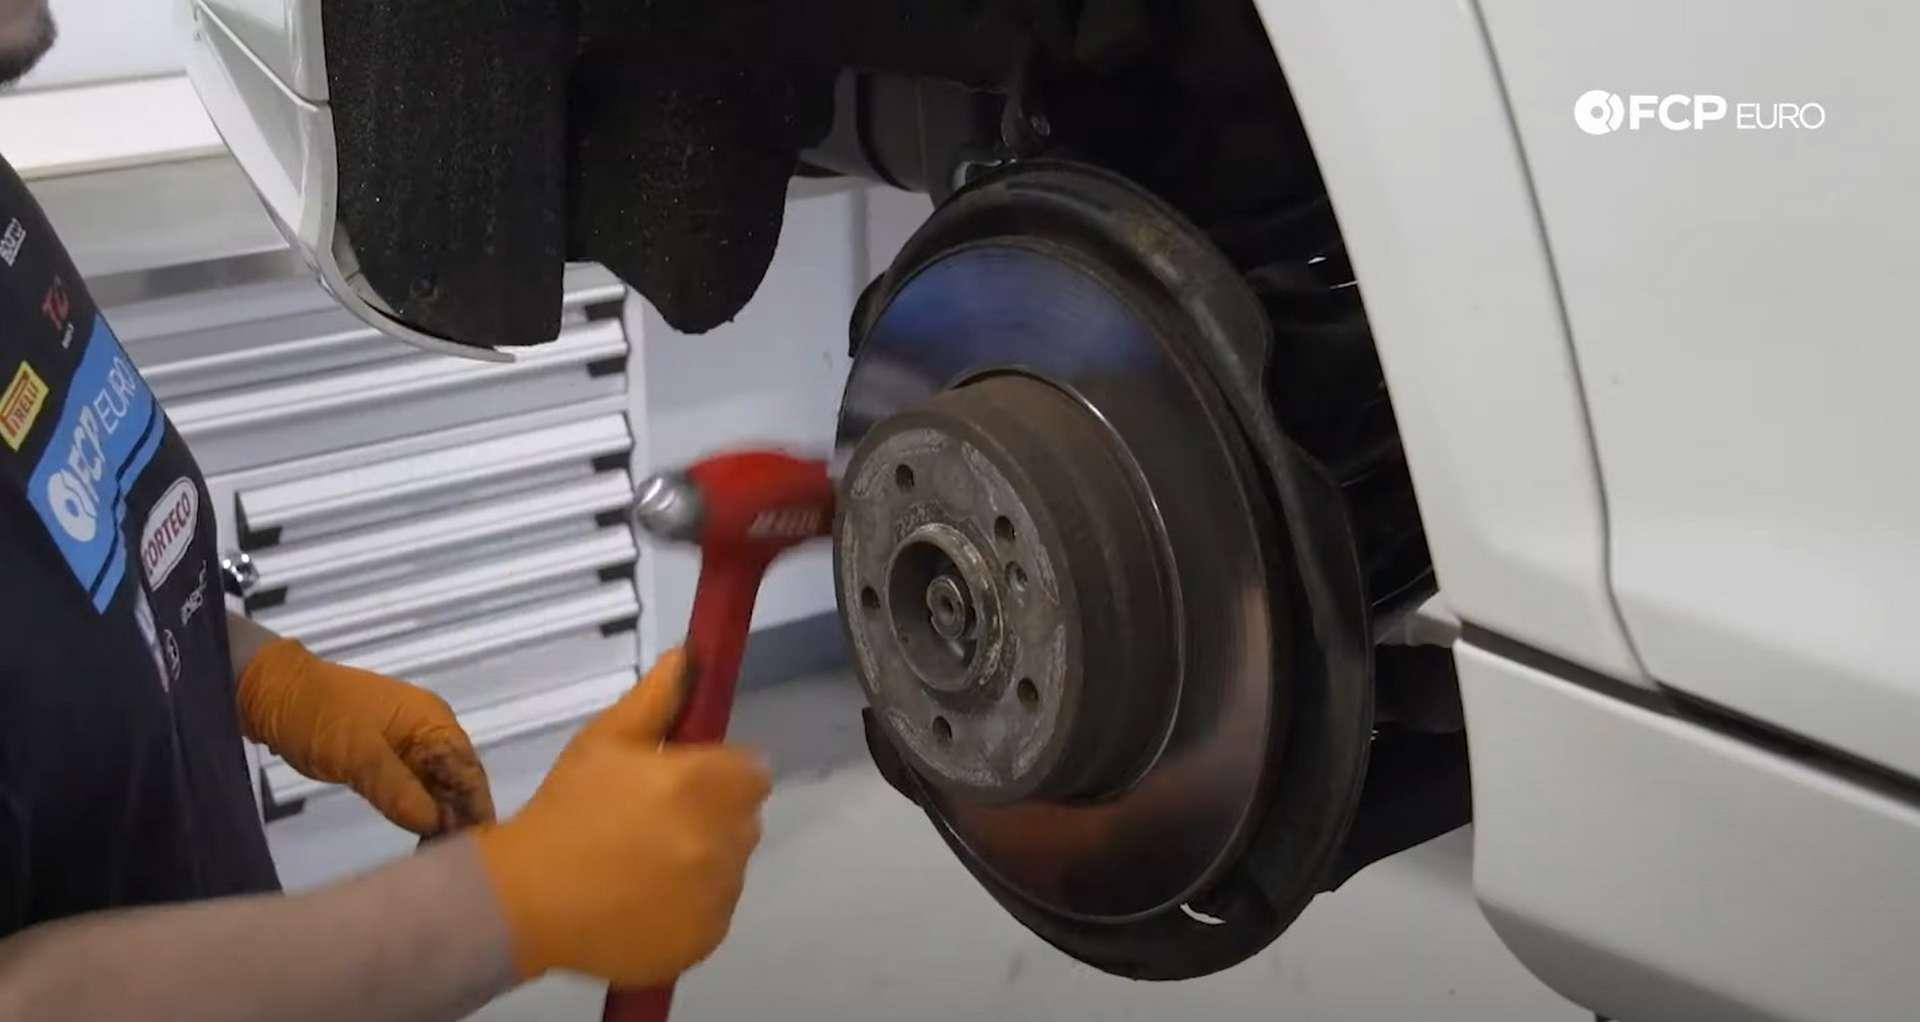 06-DIY-Mercedes-W203-Rear-Brake-Service_Replacing-Rotor